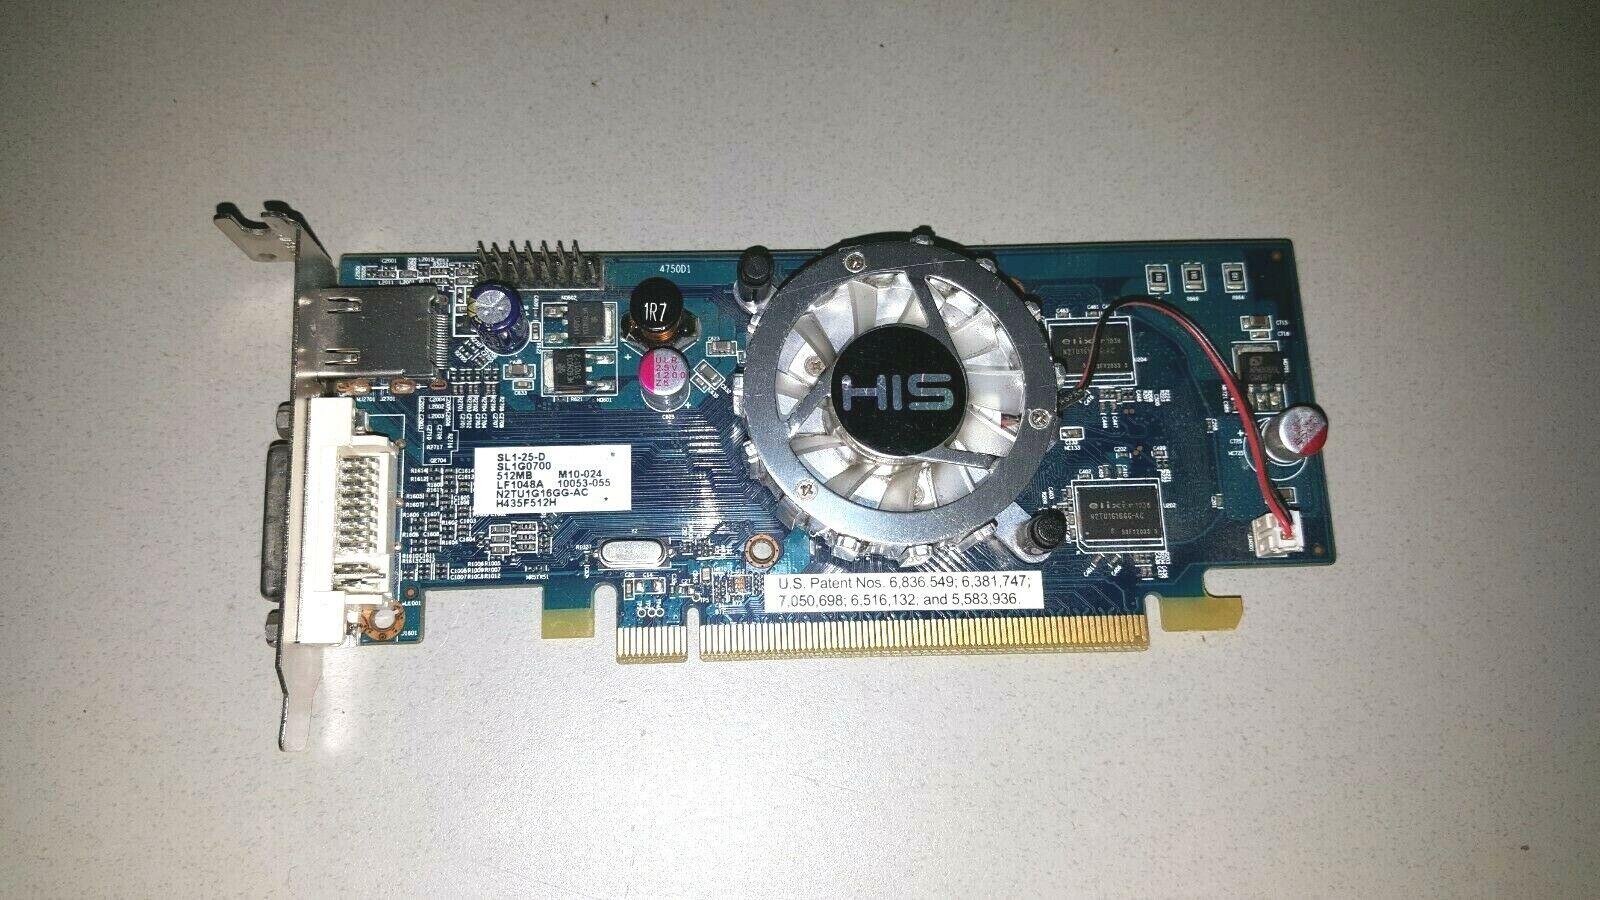 HIS HD 4350 SL1G0700 SL1-25-D HDMI DVI 512MB DDR2 PCIe PCI Express Low Profile